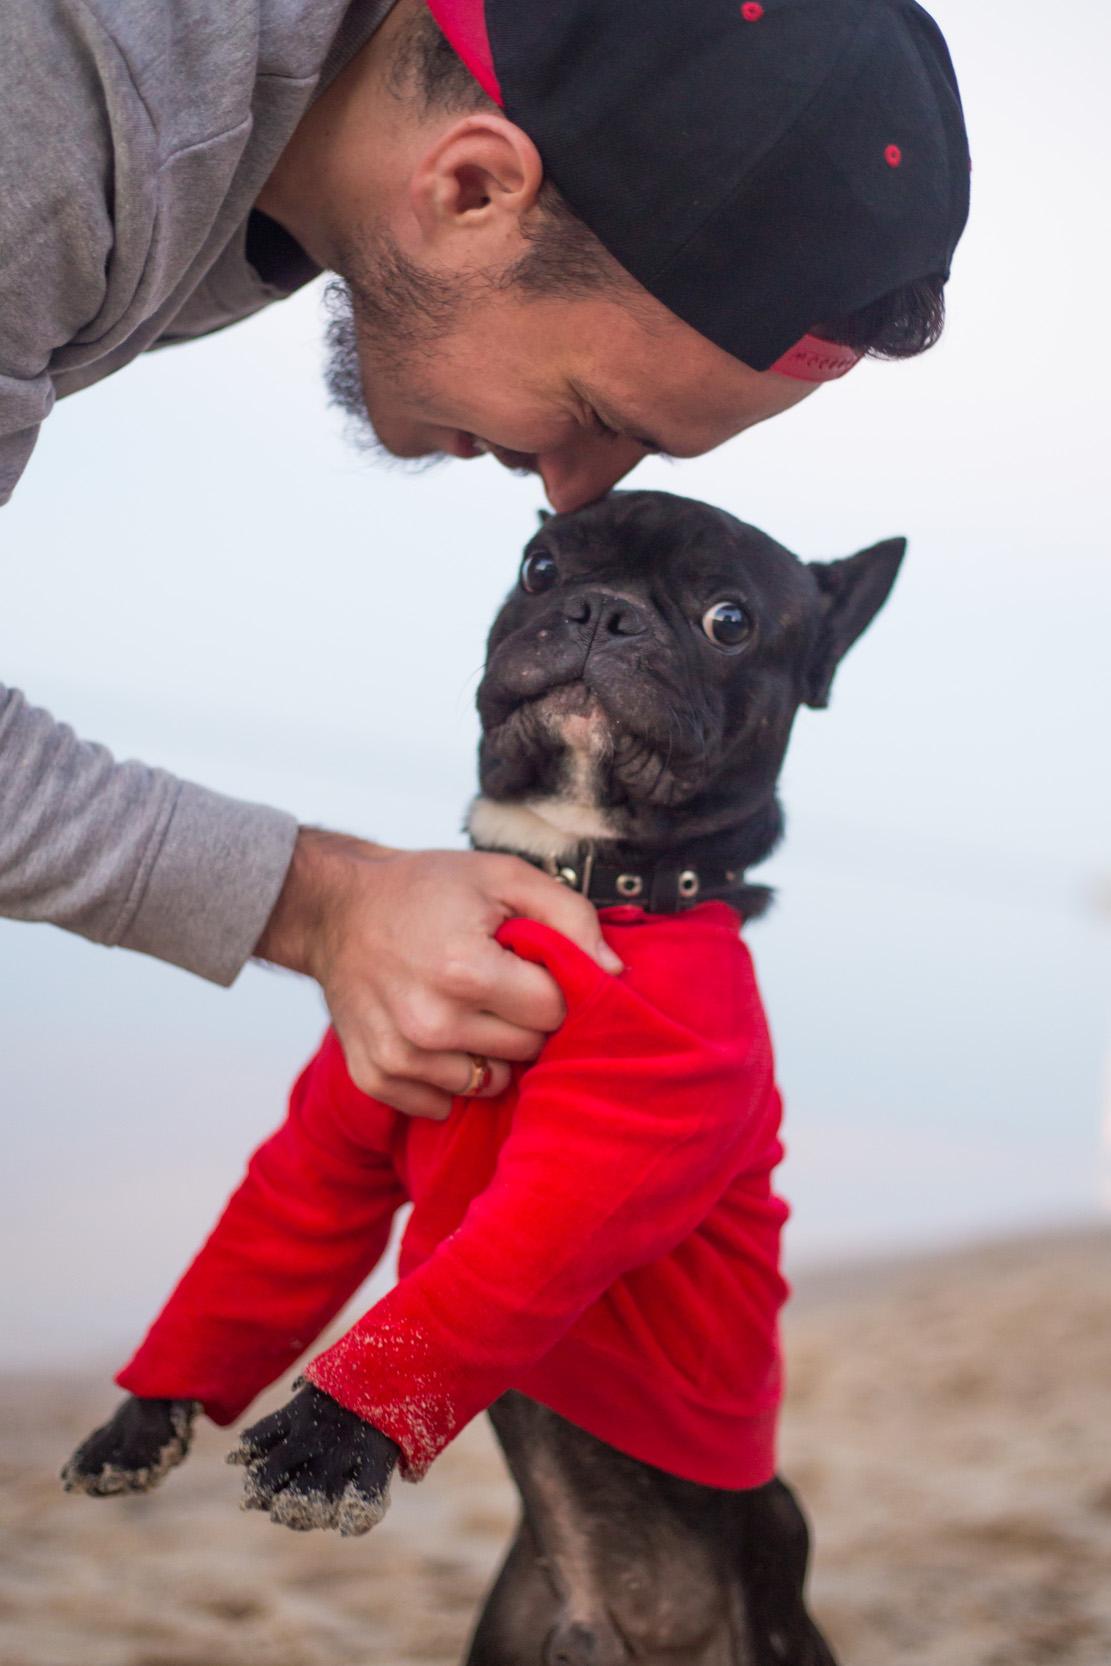 хозяин с собакой, фото с французким бульдогом